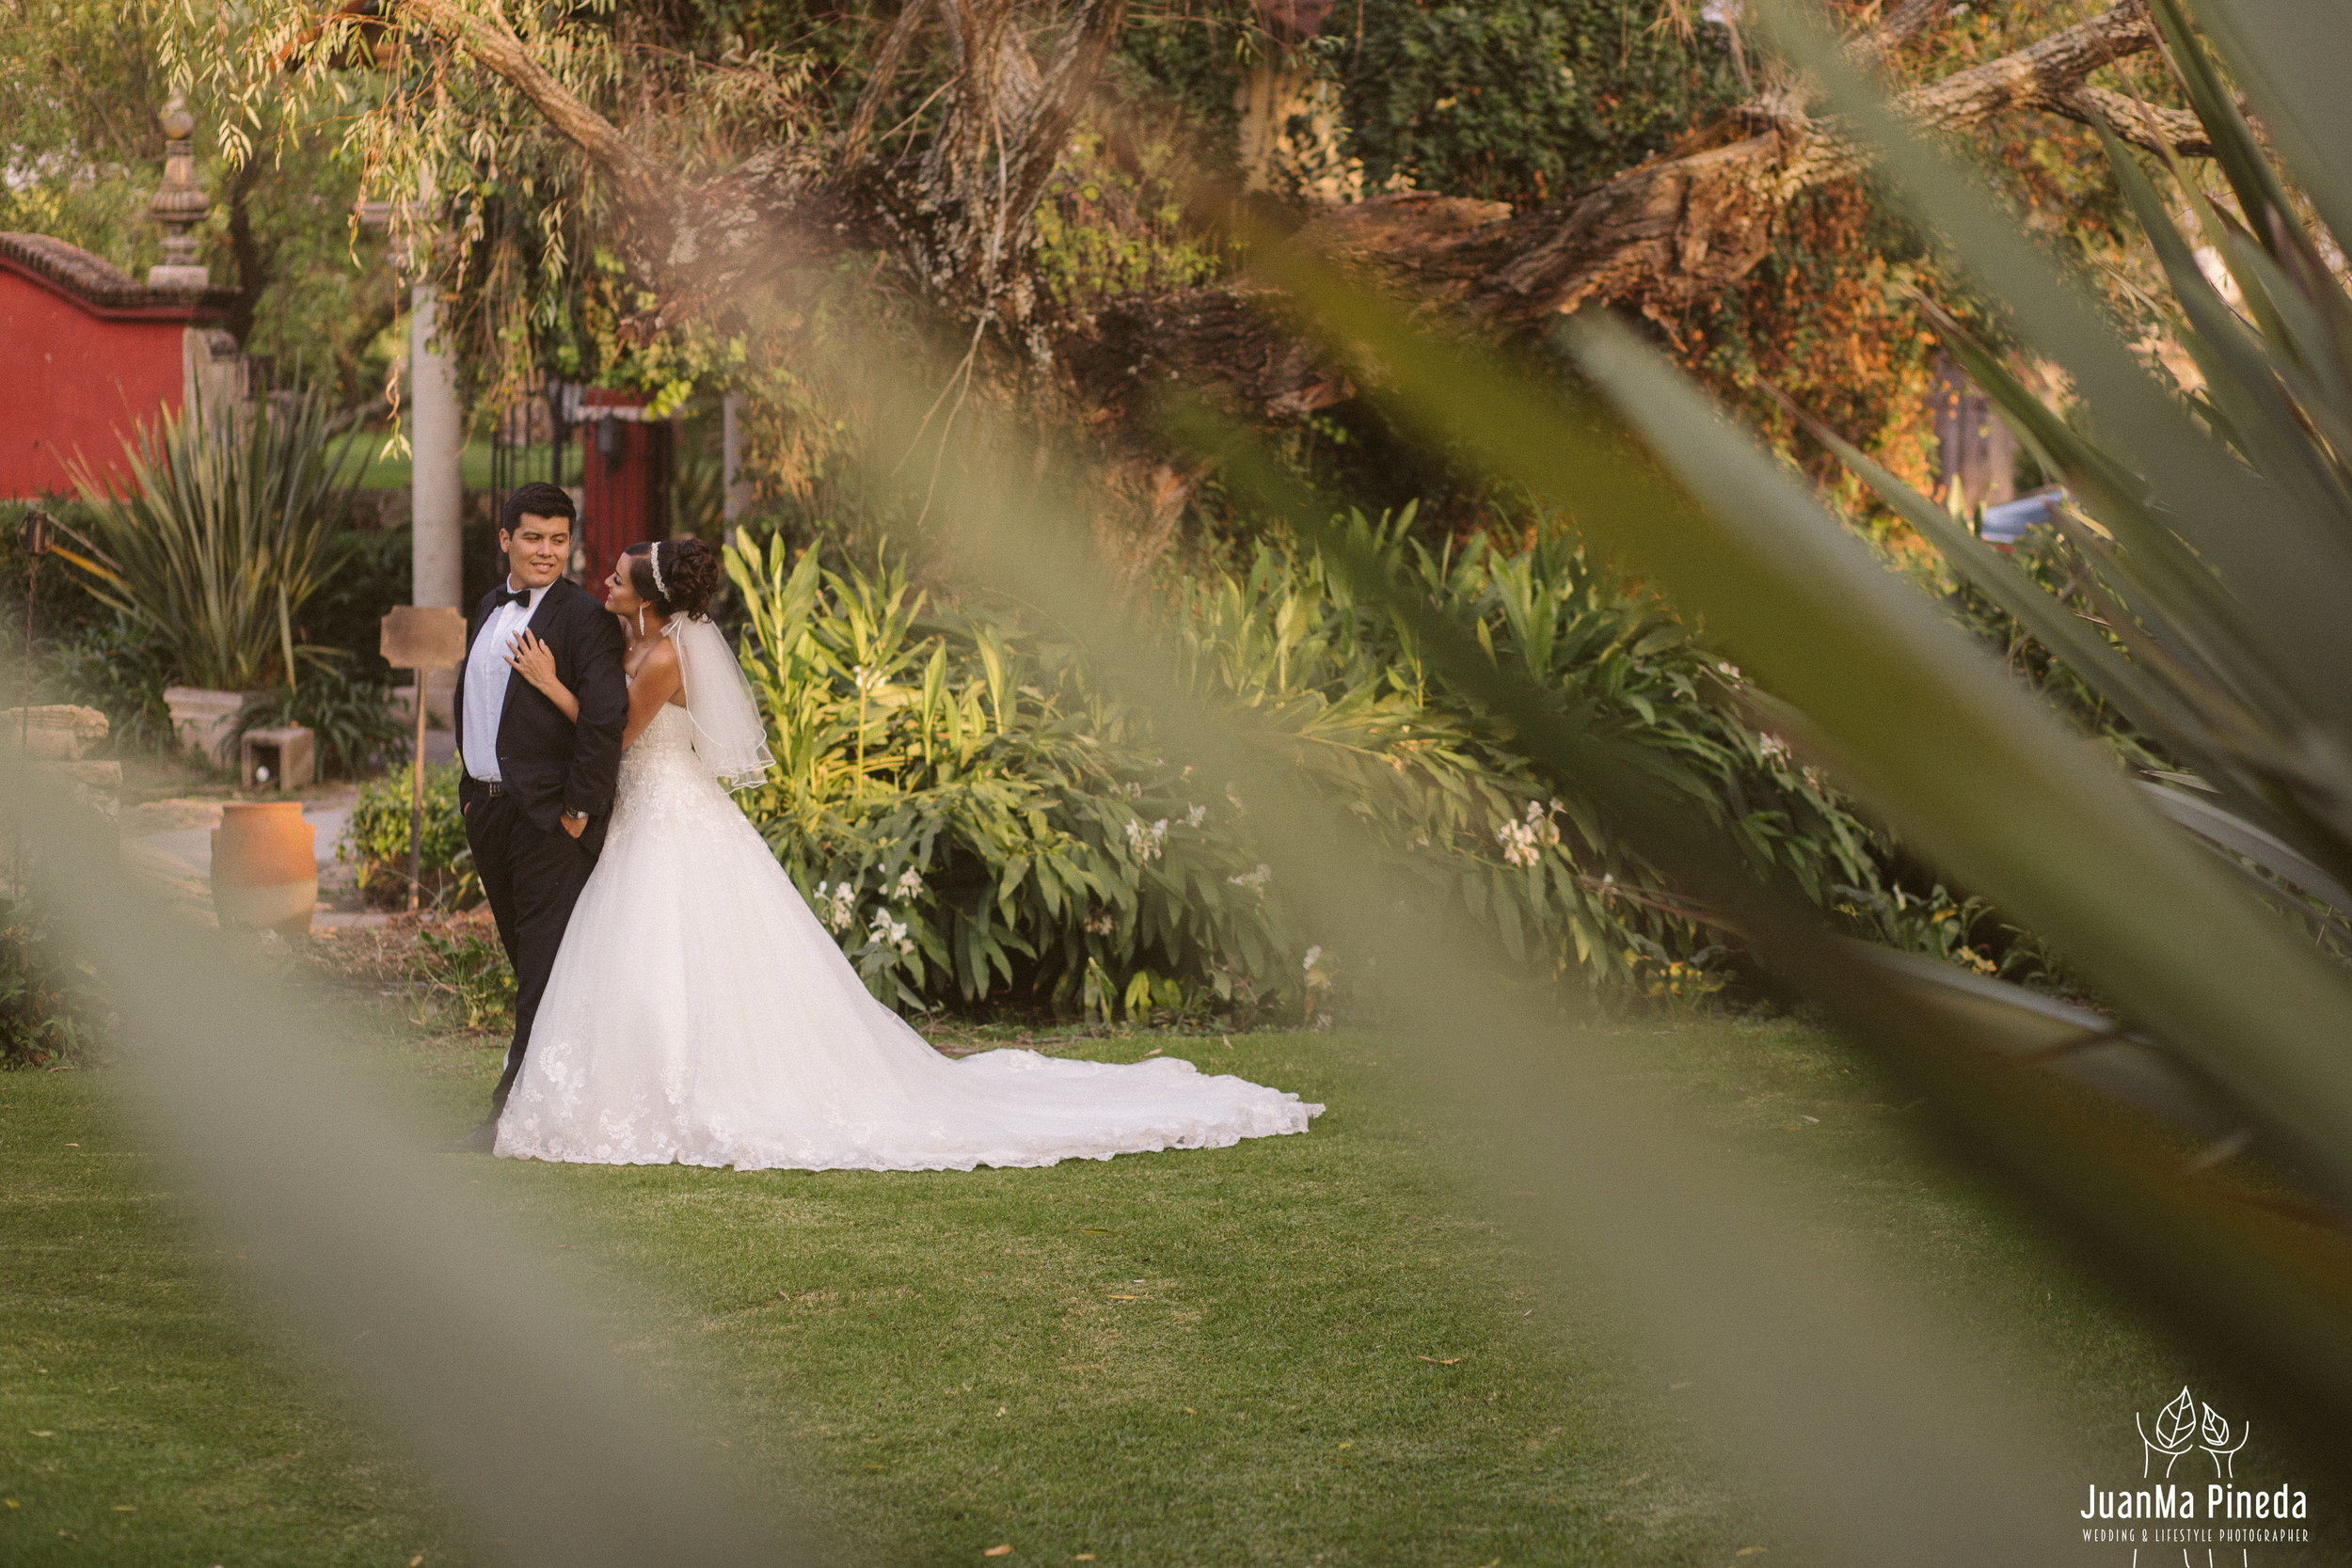 Wedding+Photographer+Mexico-1-3.jpg